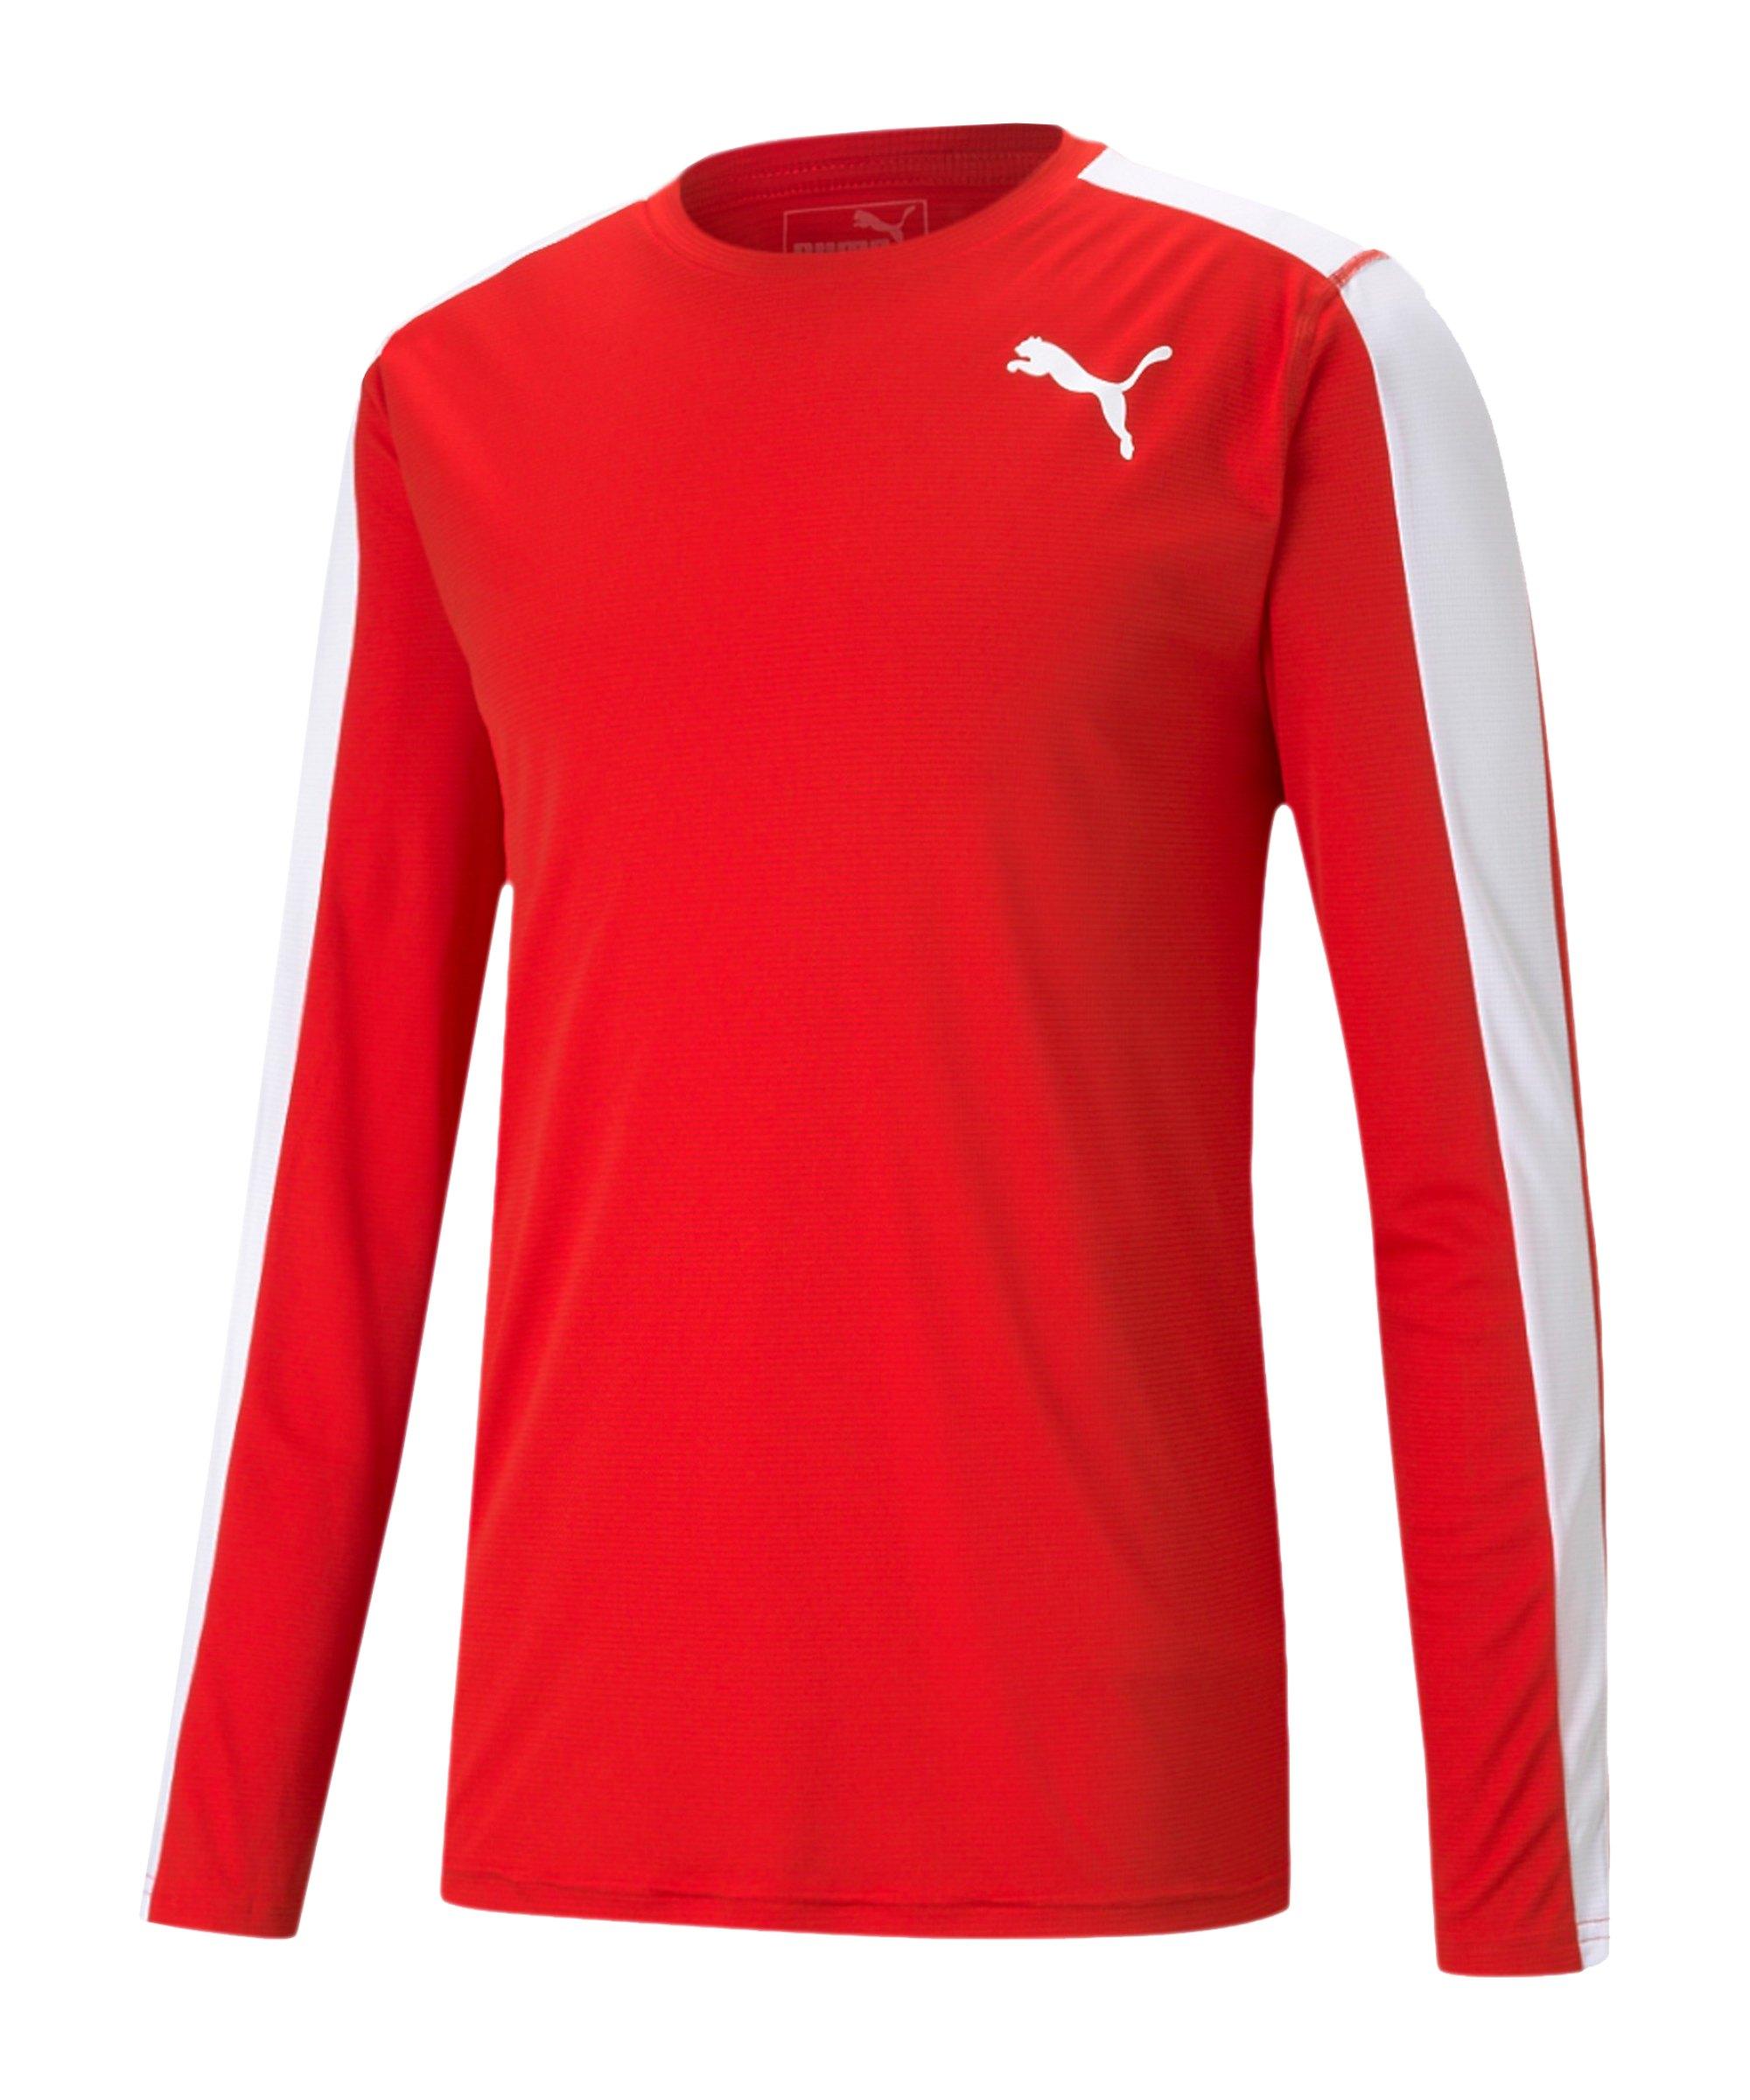 PUMA Cross the Line Sweatshirt Rot Weiss F05 - rot